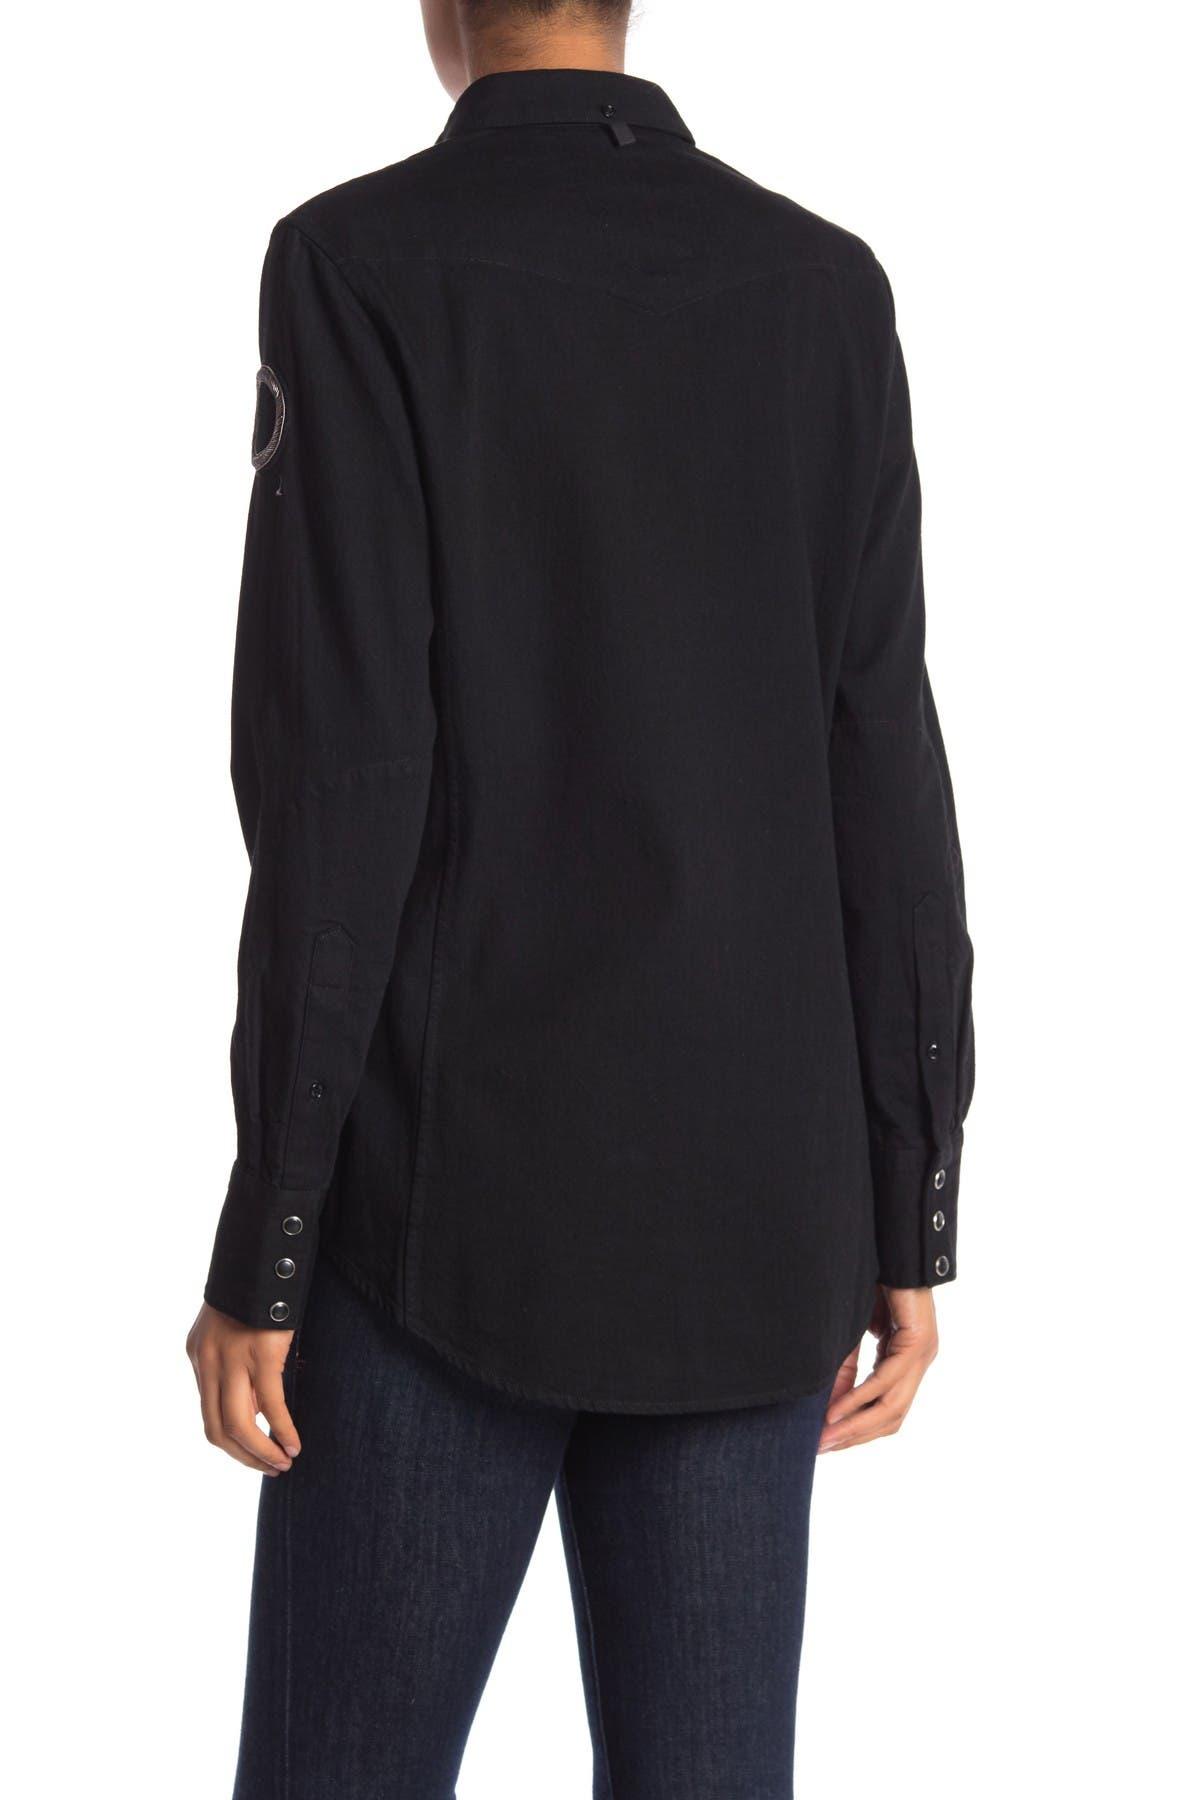 Image of Rag & Bone Jasper Button Down Shirt